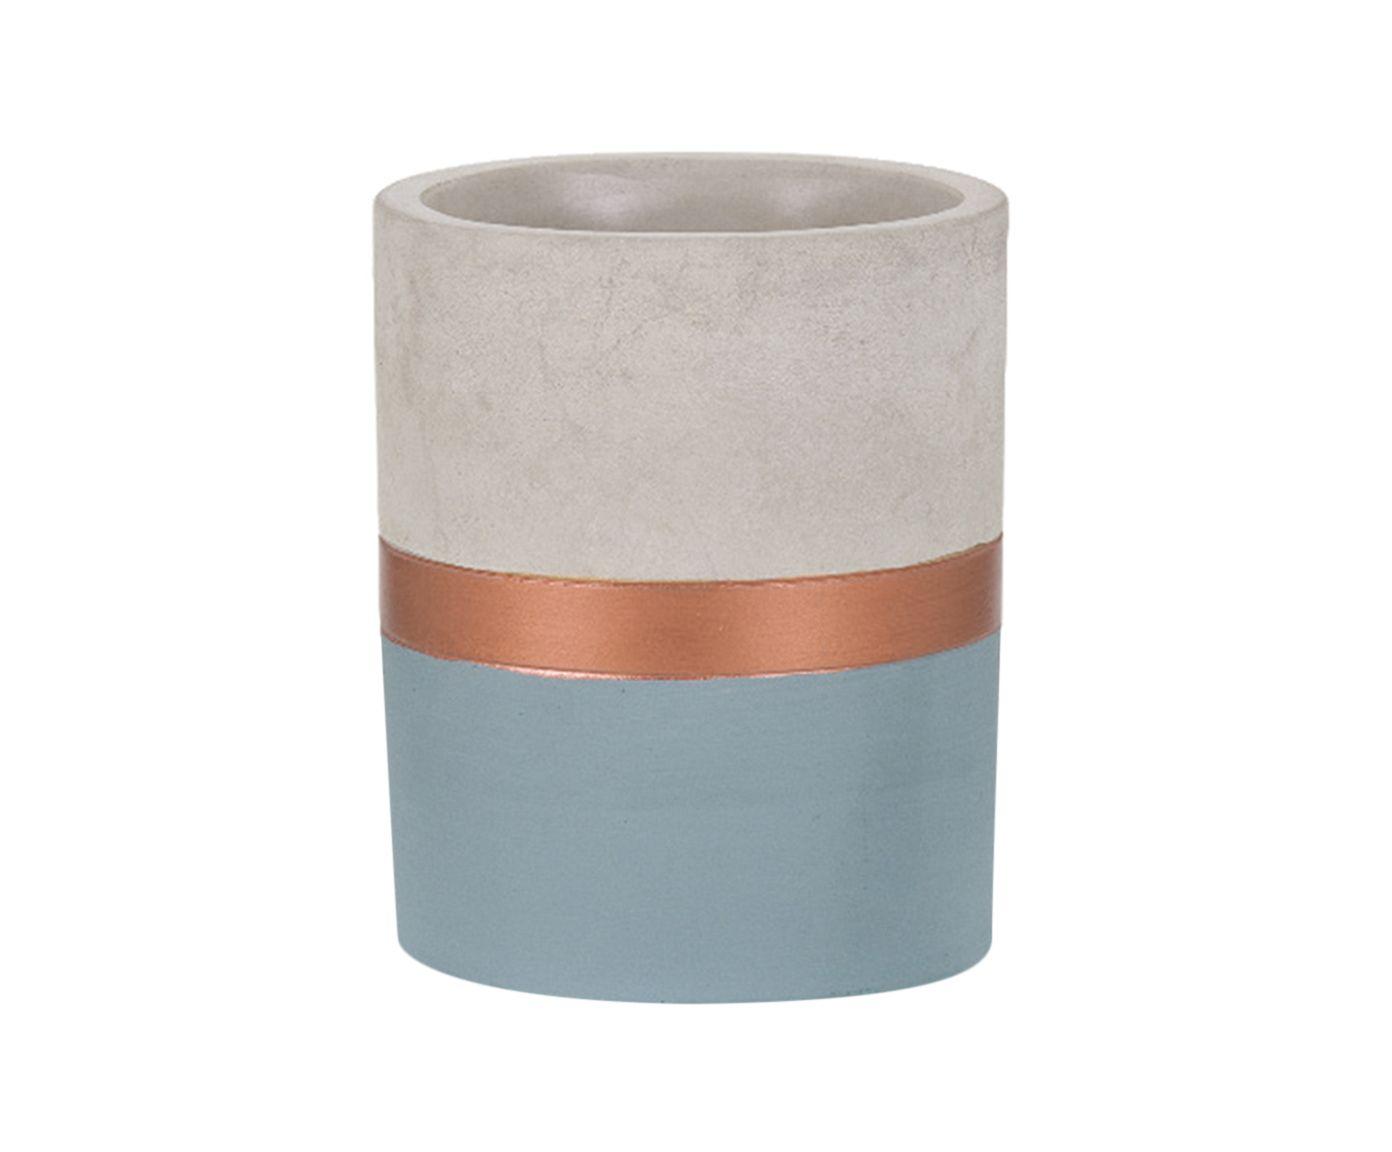 Vaso Eva Azul - 9X8cm   Westwing.com.br